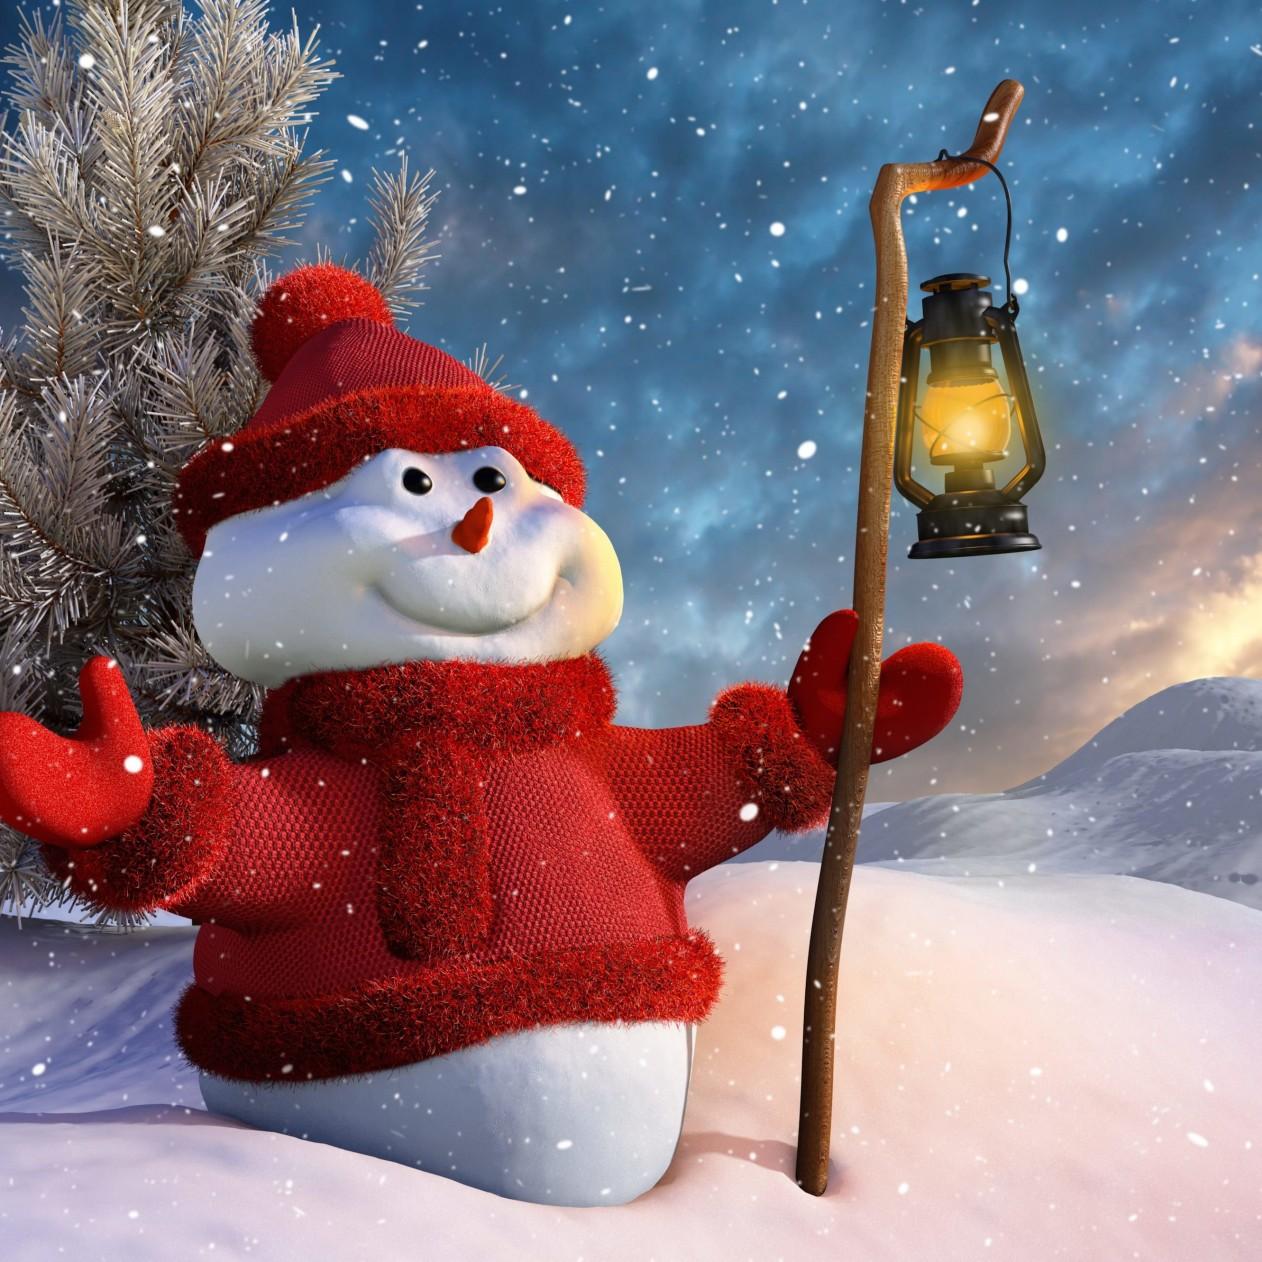 Christmas snowman wallpaper for ipad mini 92 406 jpg